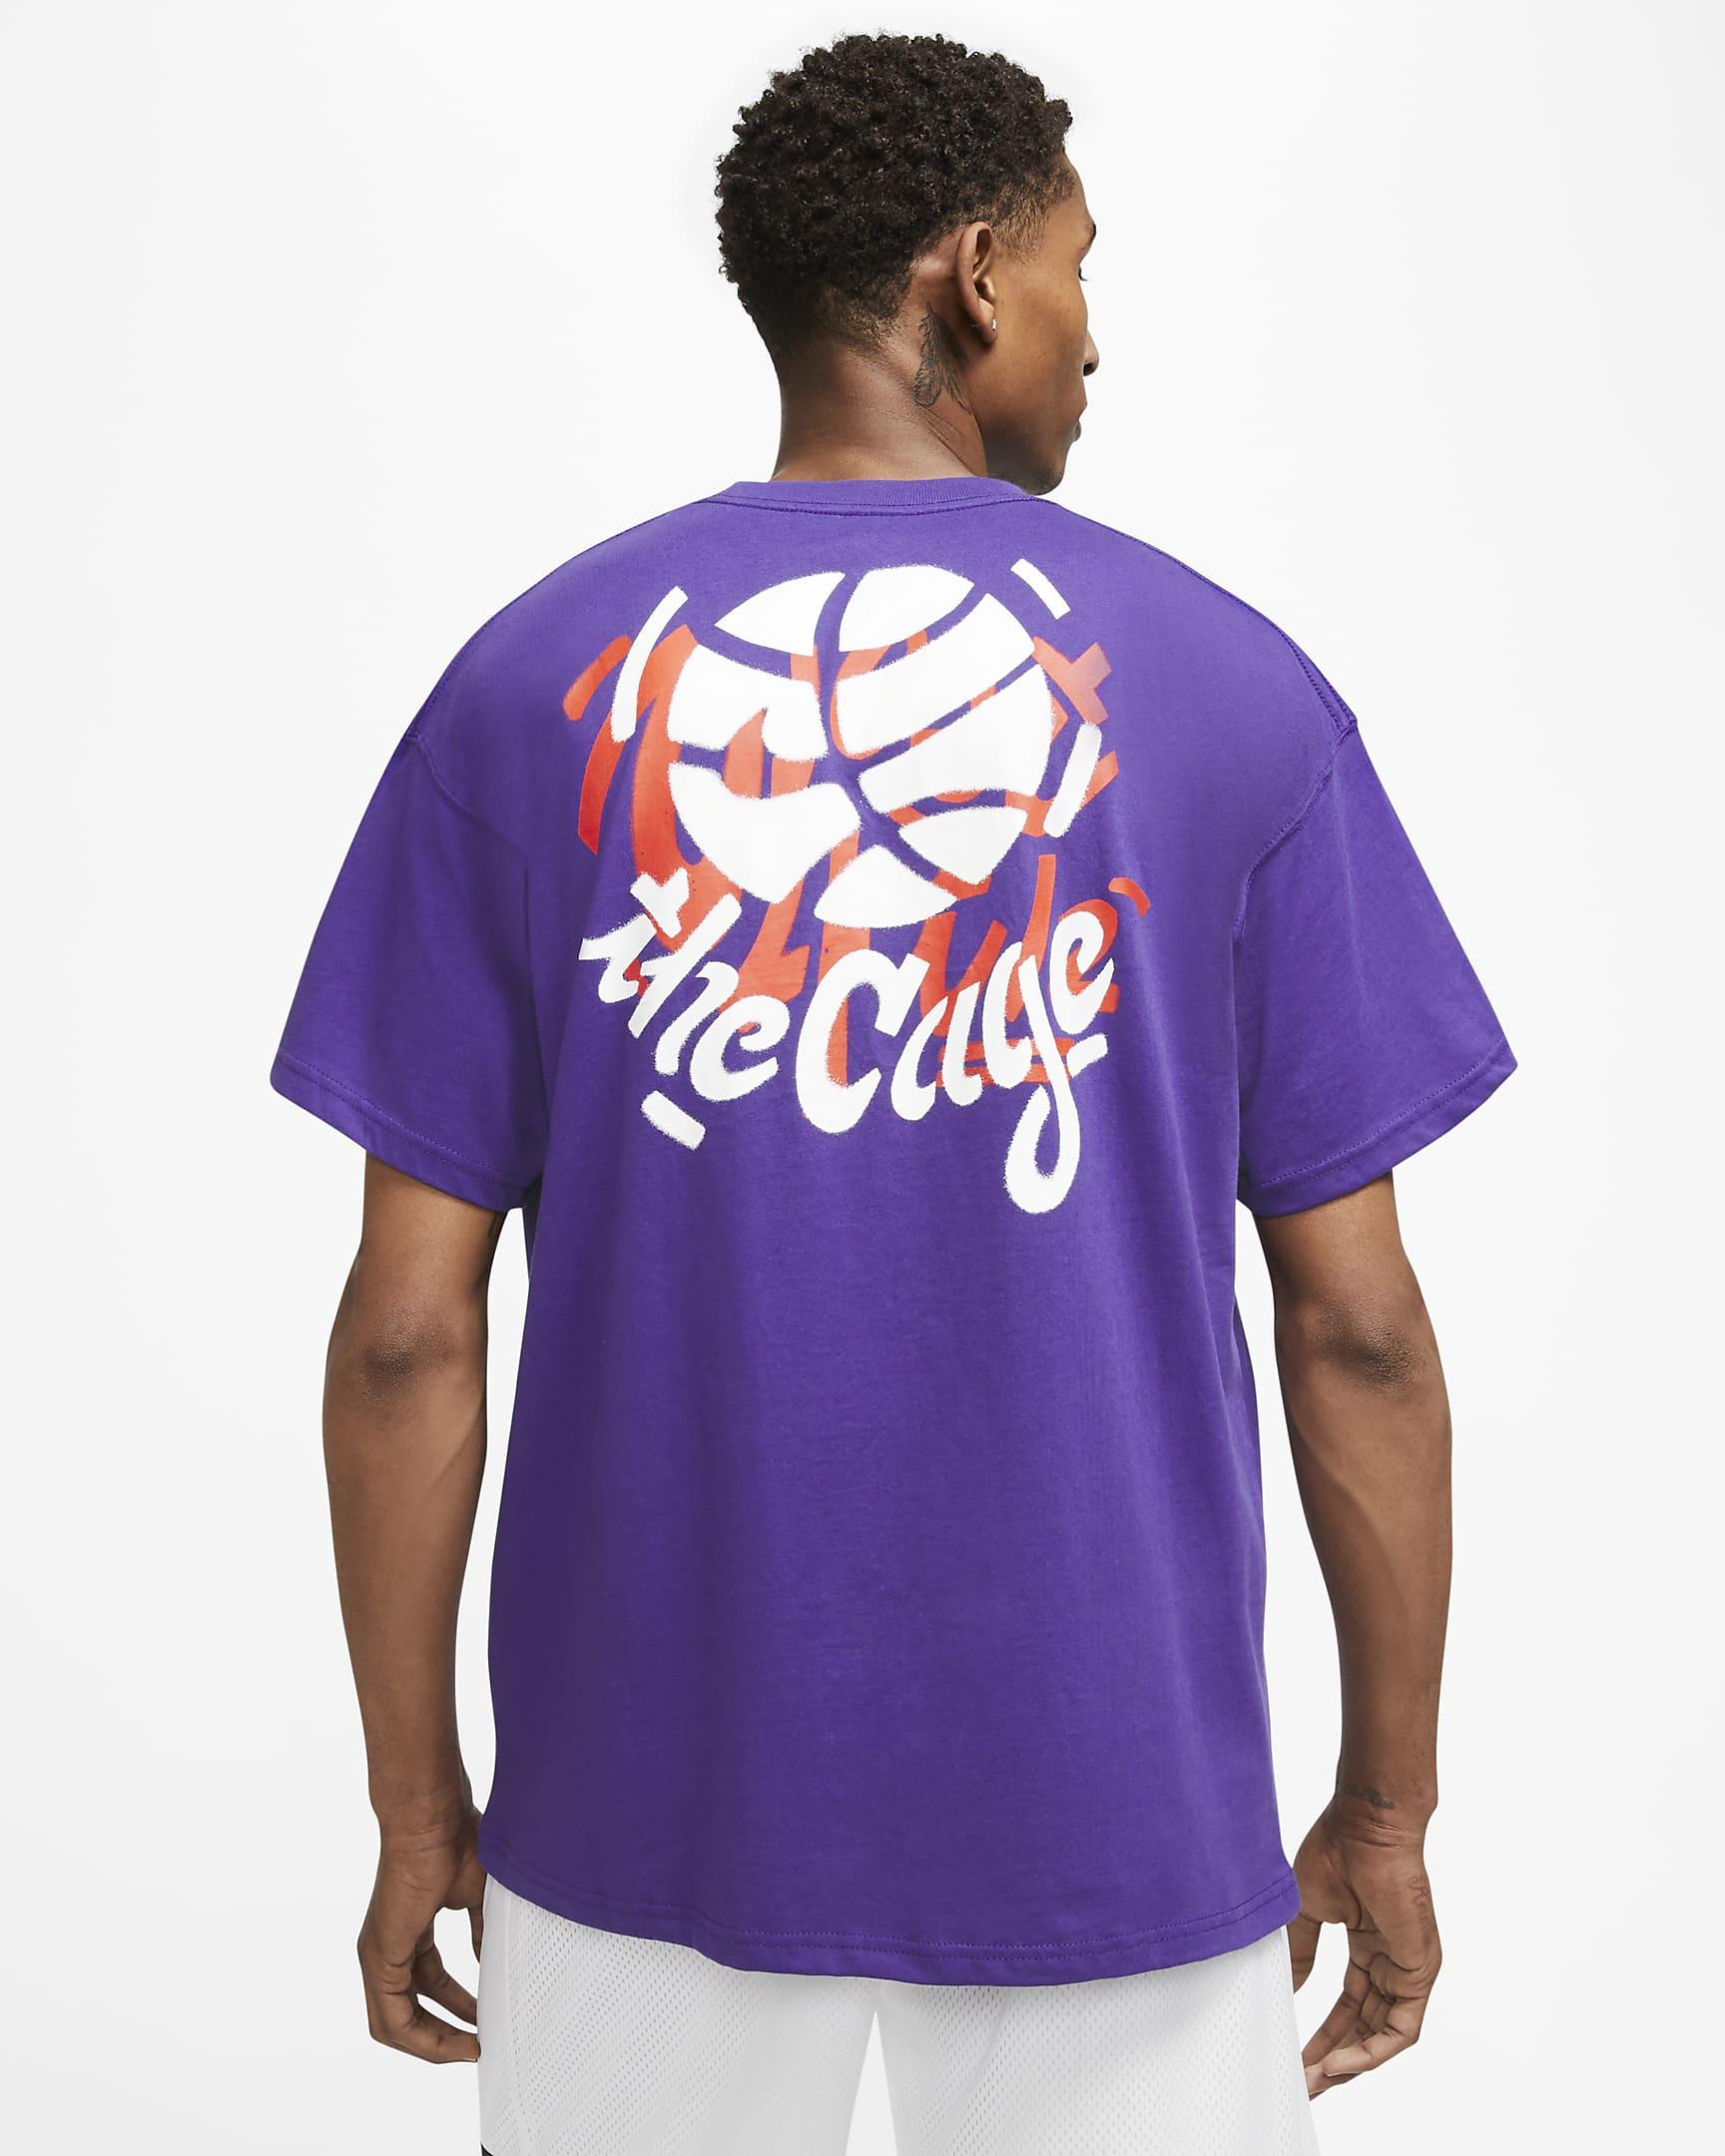 dri-fit-ny-vs-ny-west-4th-mens-basketball-t-shirt-rsvV2d-1.png